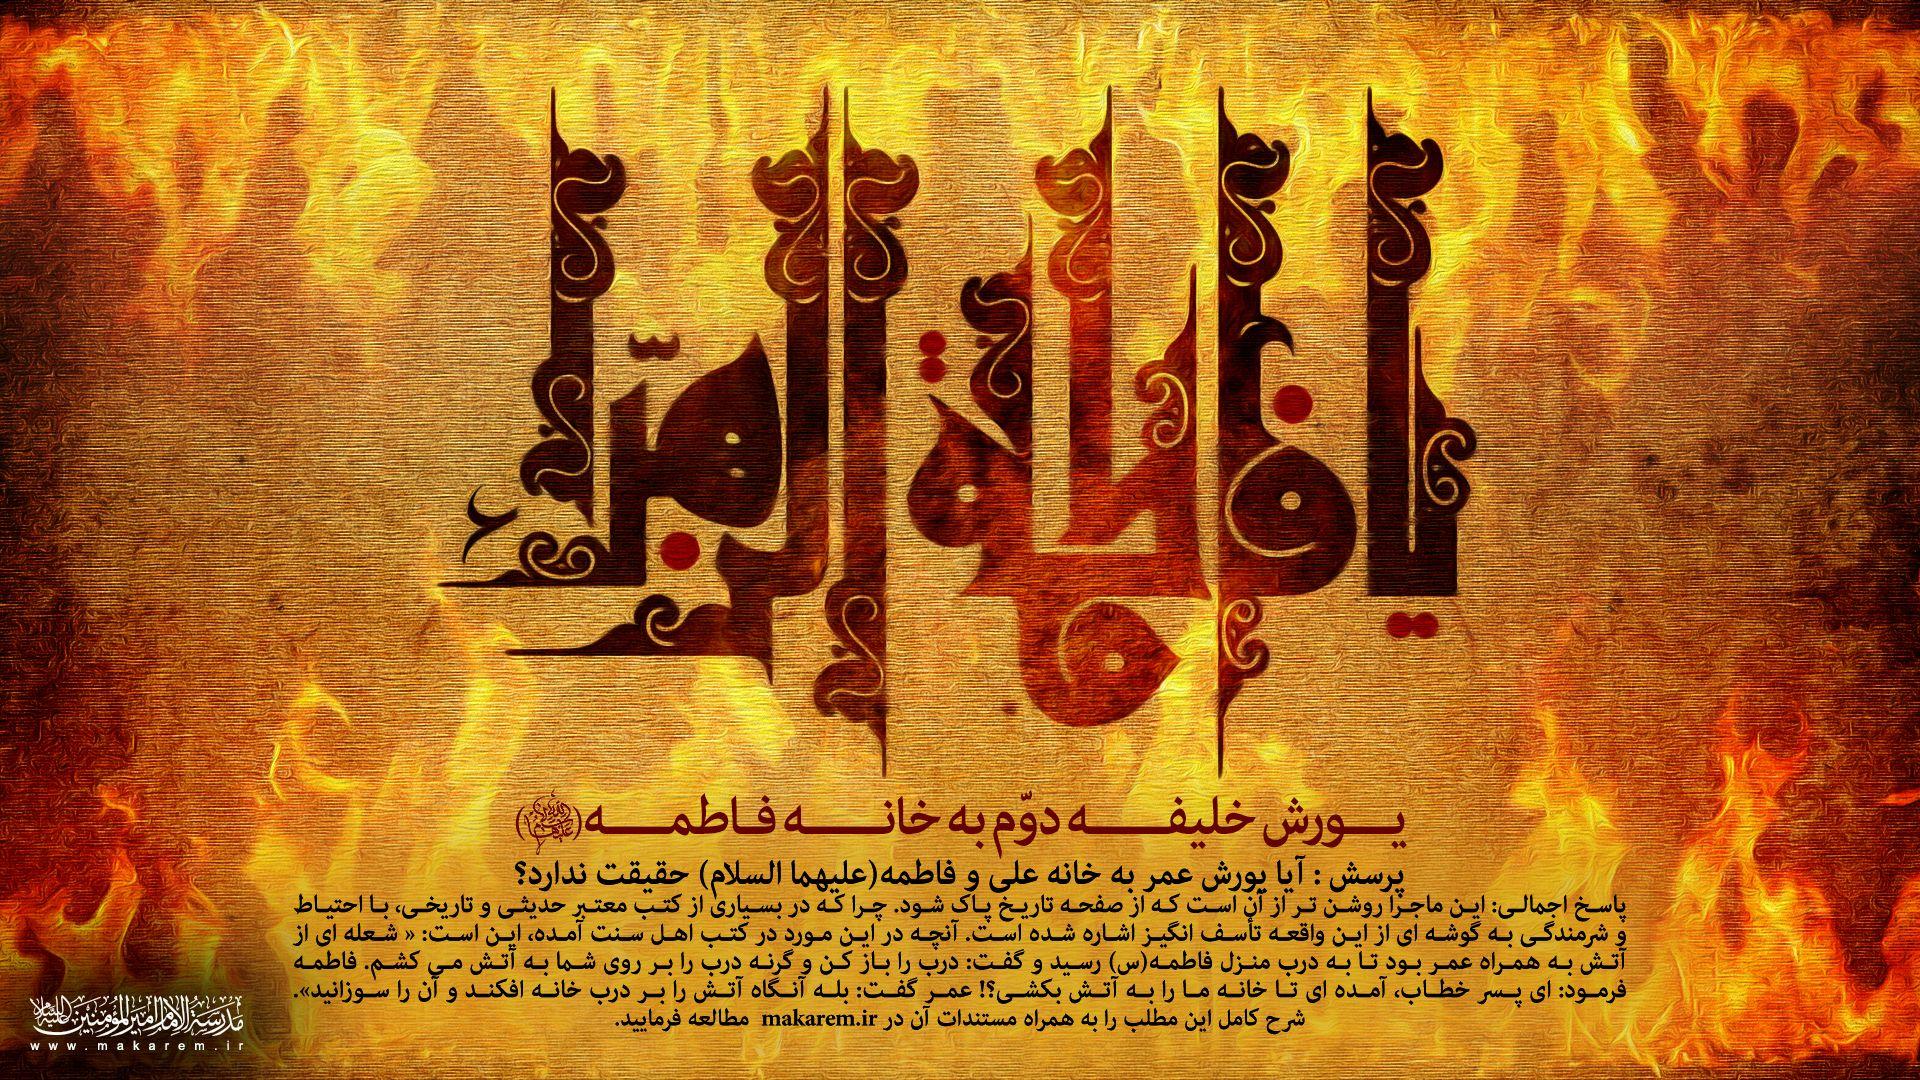 حضرت مادر 03-مدرسه الامام امیر المومنین (ع)